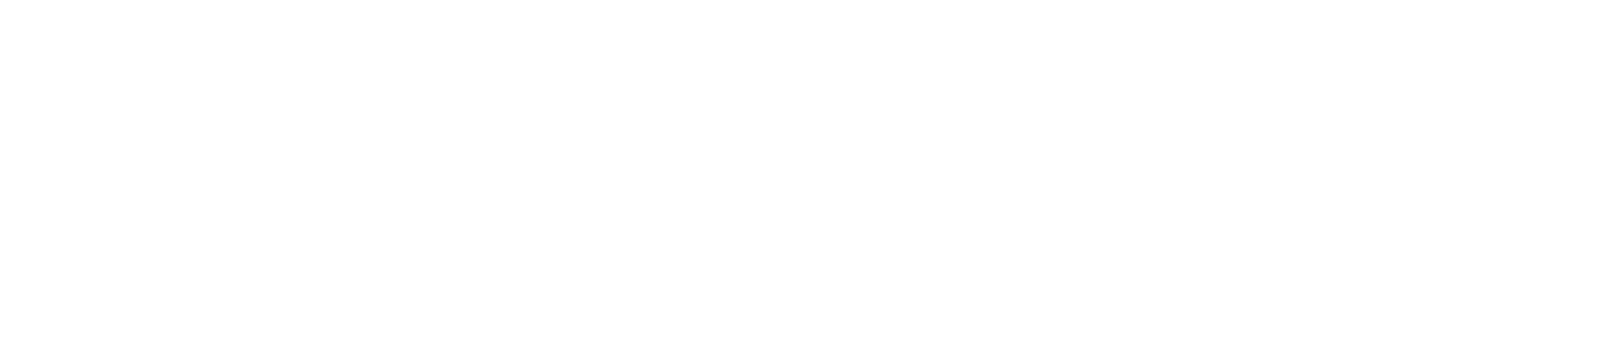 converge_logo-white-1.png